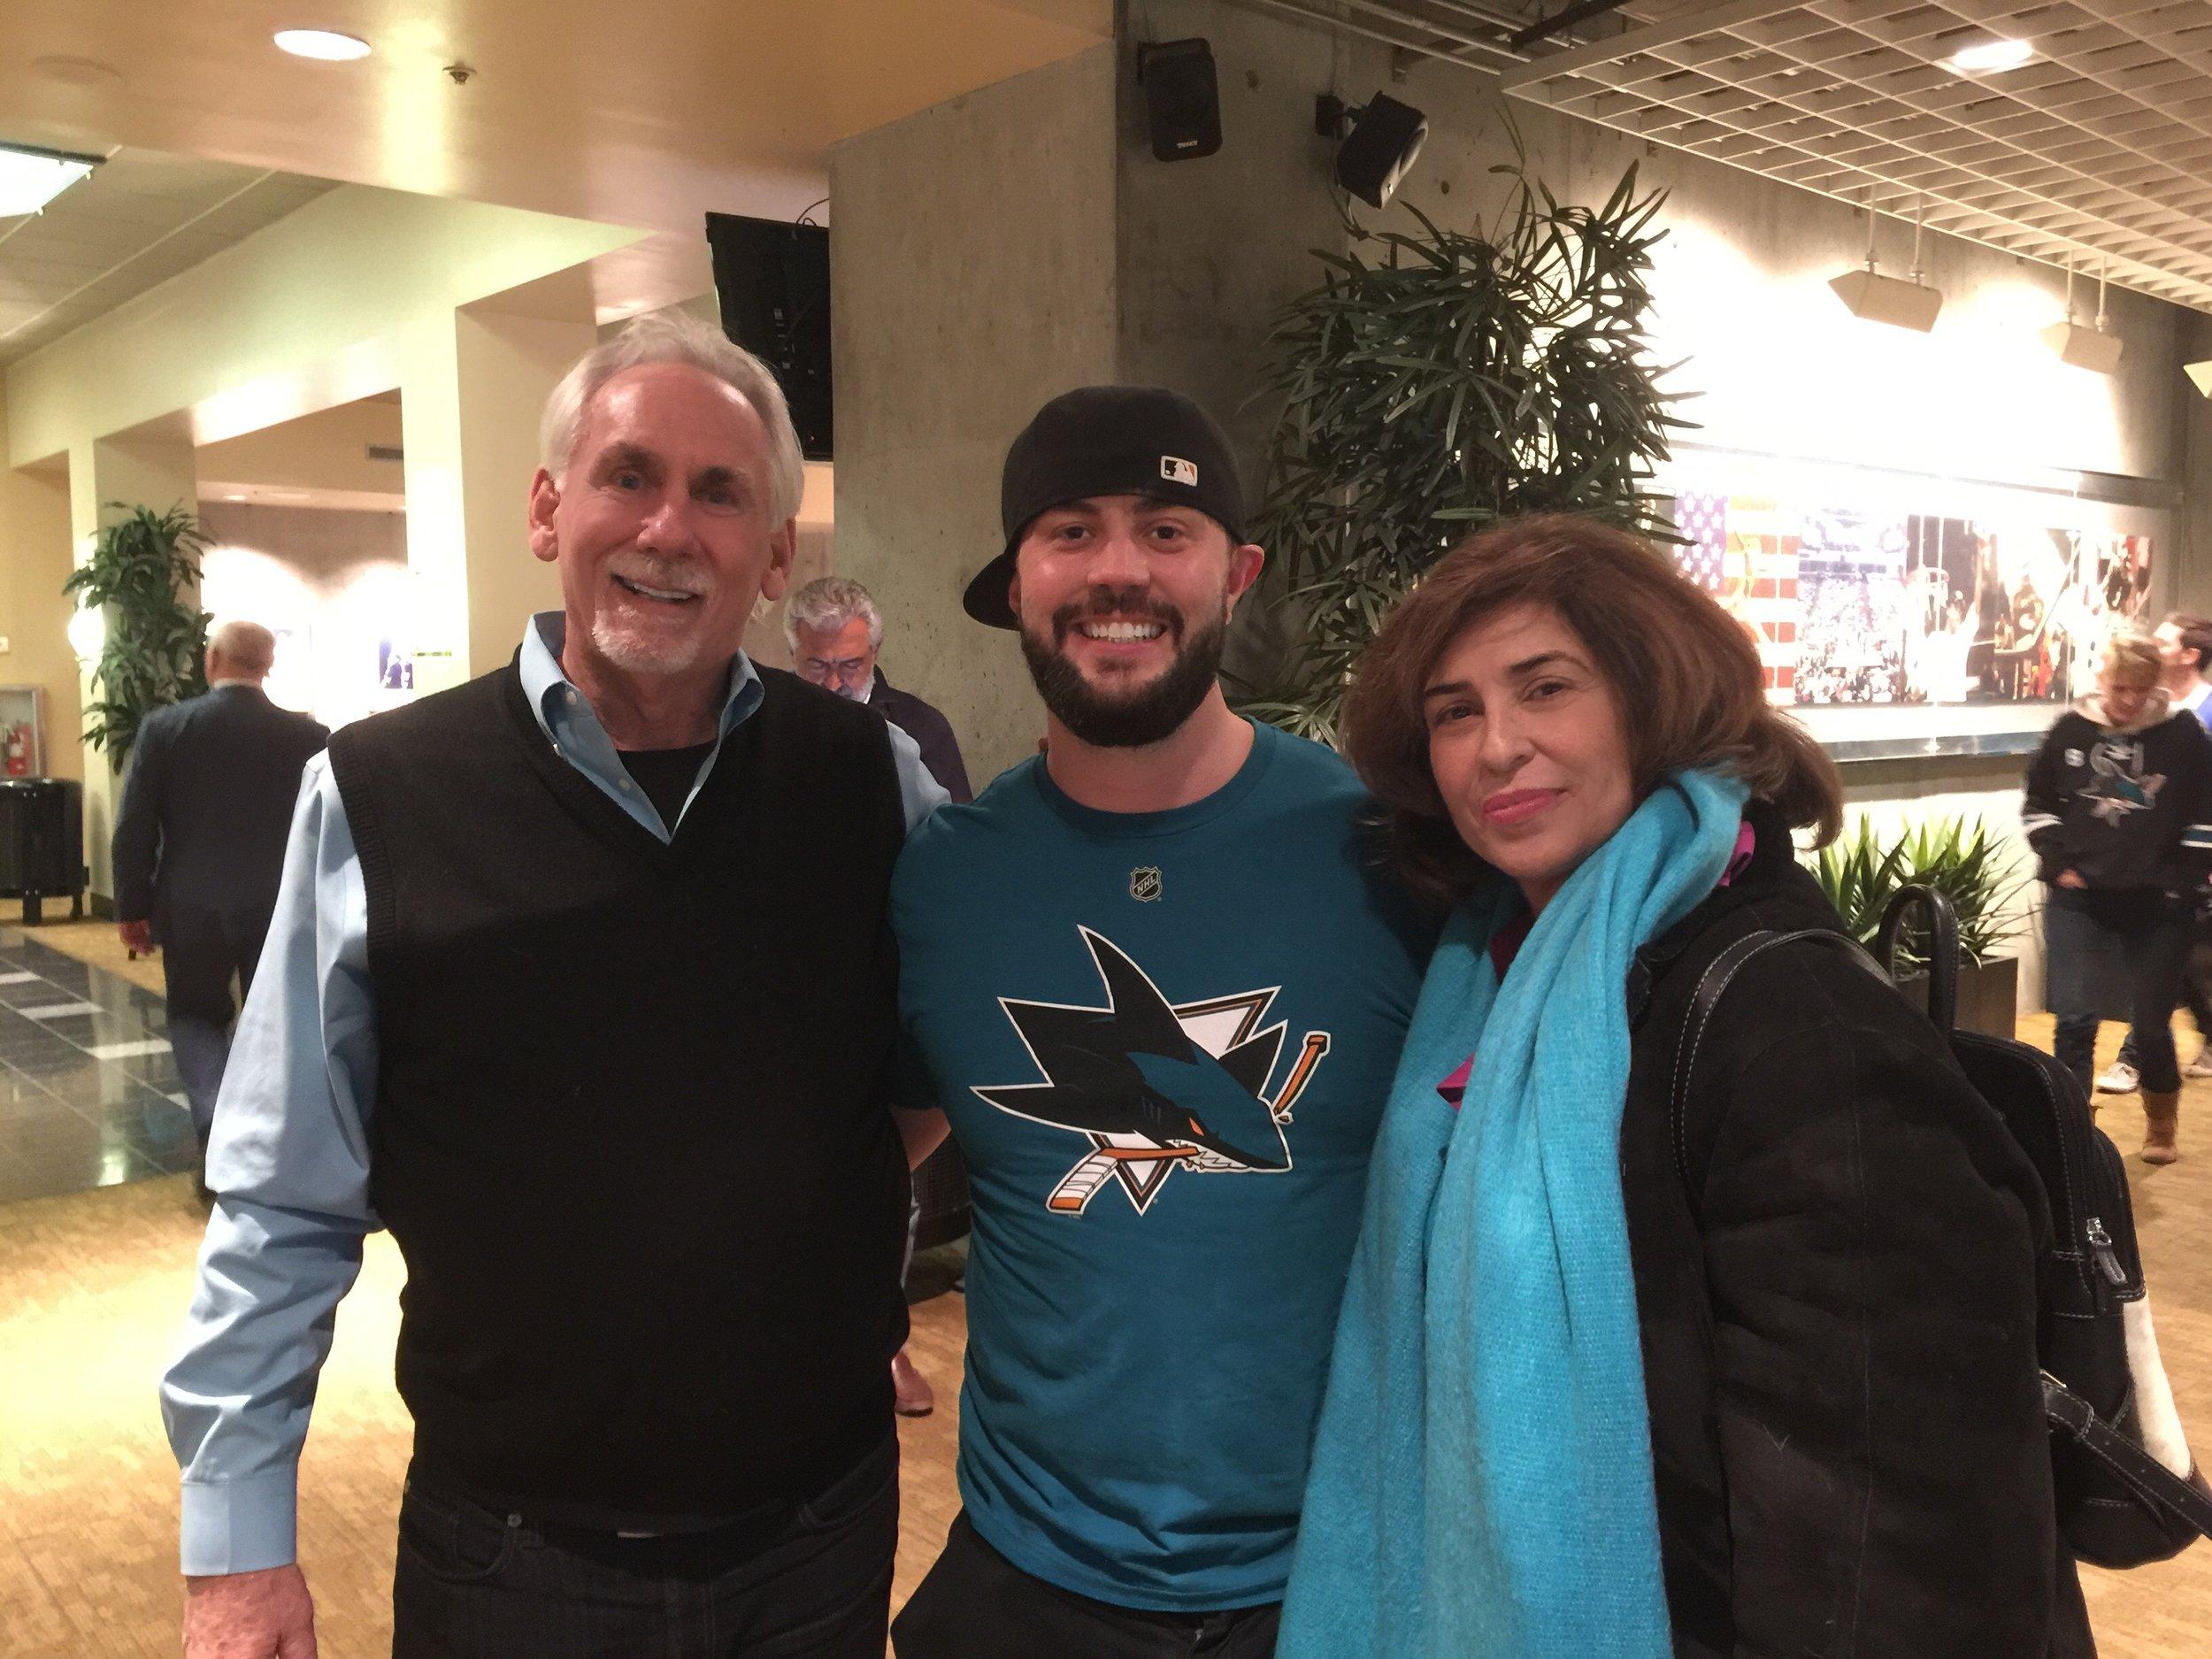 Clay Goodman, KMOVE Radio and wife, Tina with Tim Rainey